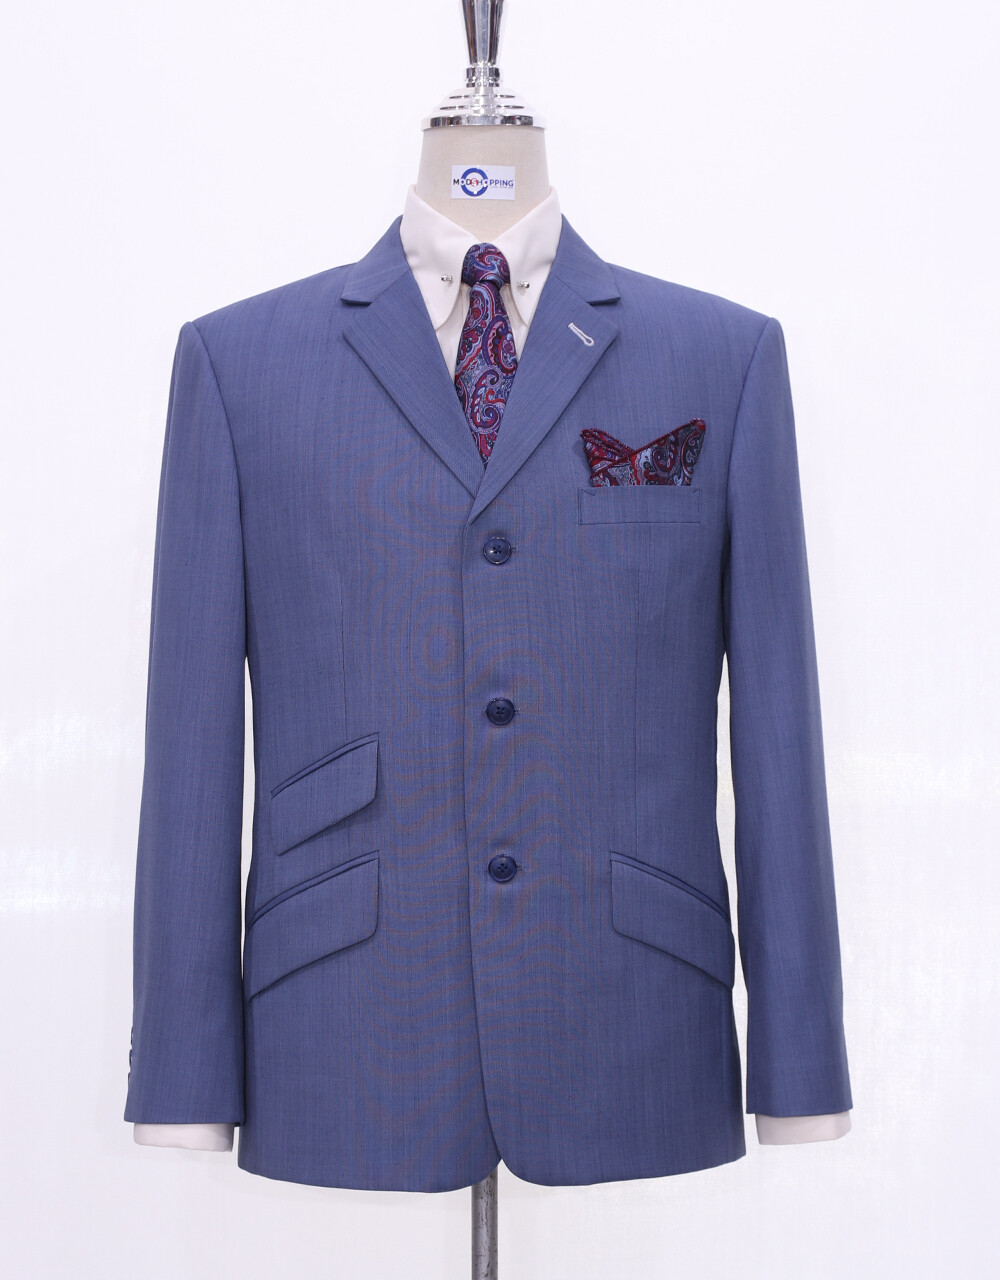 Summer Jacket 60s Style Steel Blue Summer Blazer Jacket